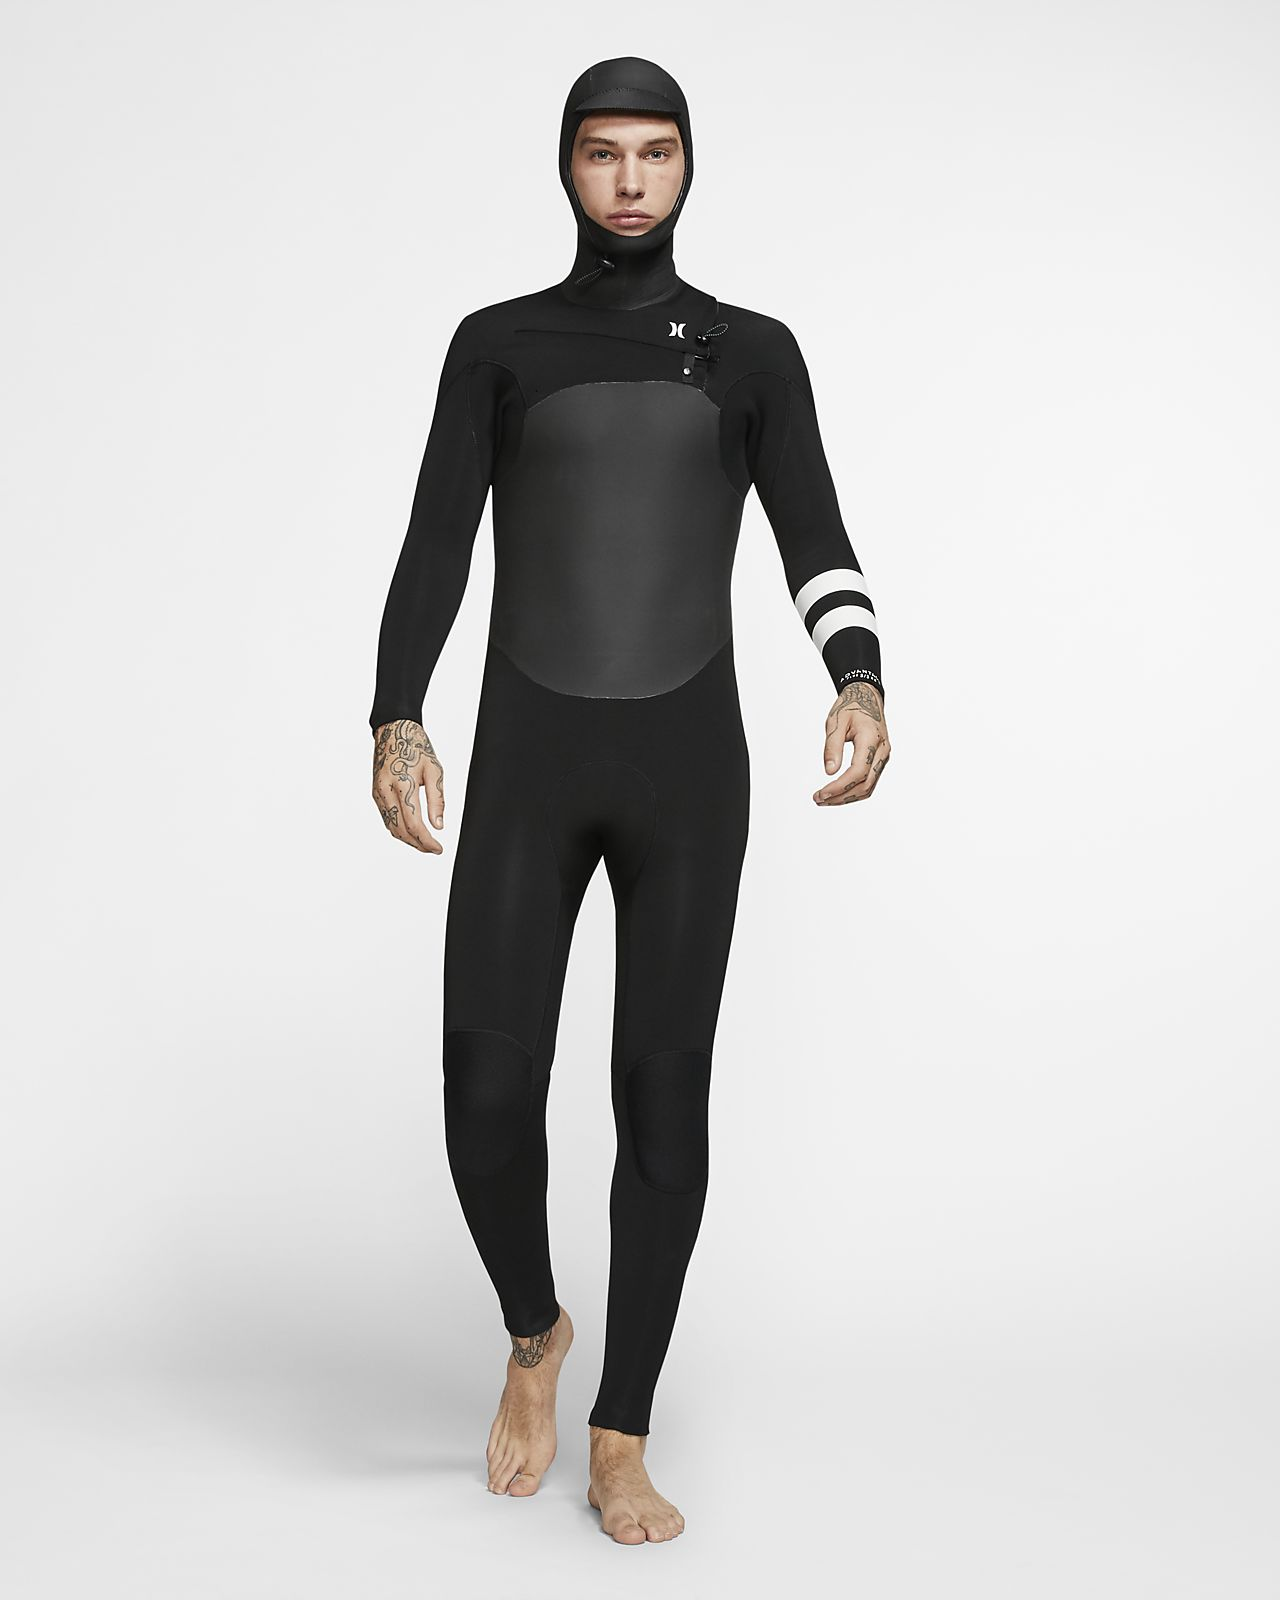 Traje de neopreno con capucha para hombre Hurley Advantage Plus 5/3mm Fullsuit